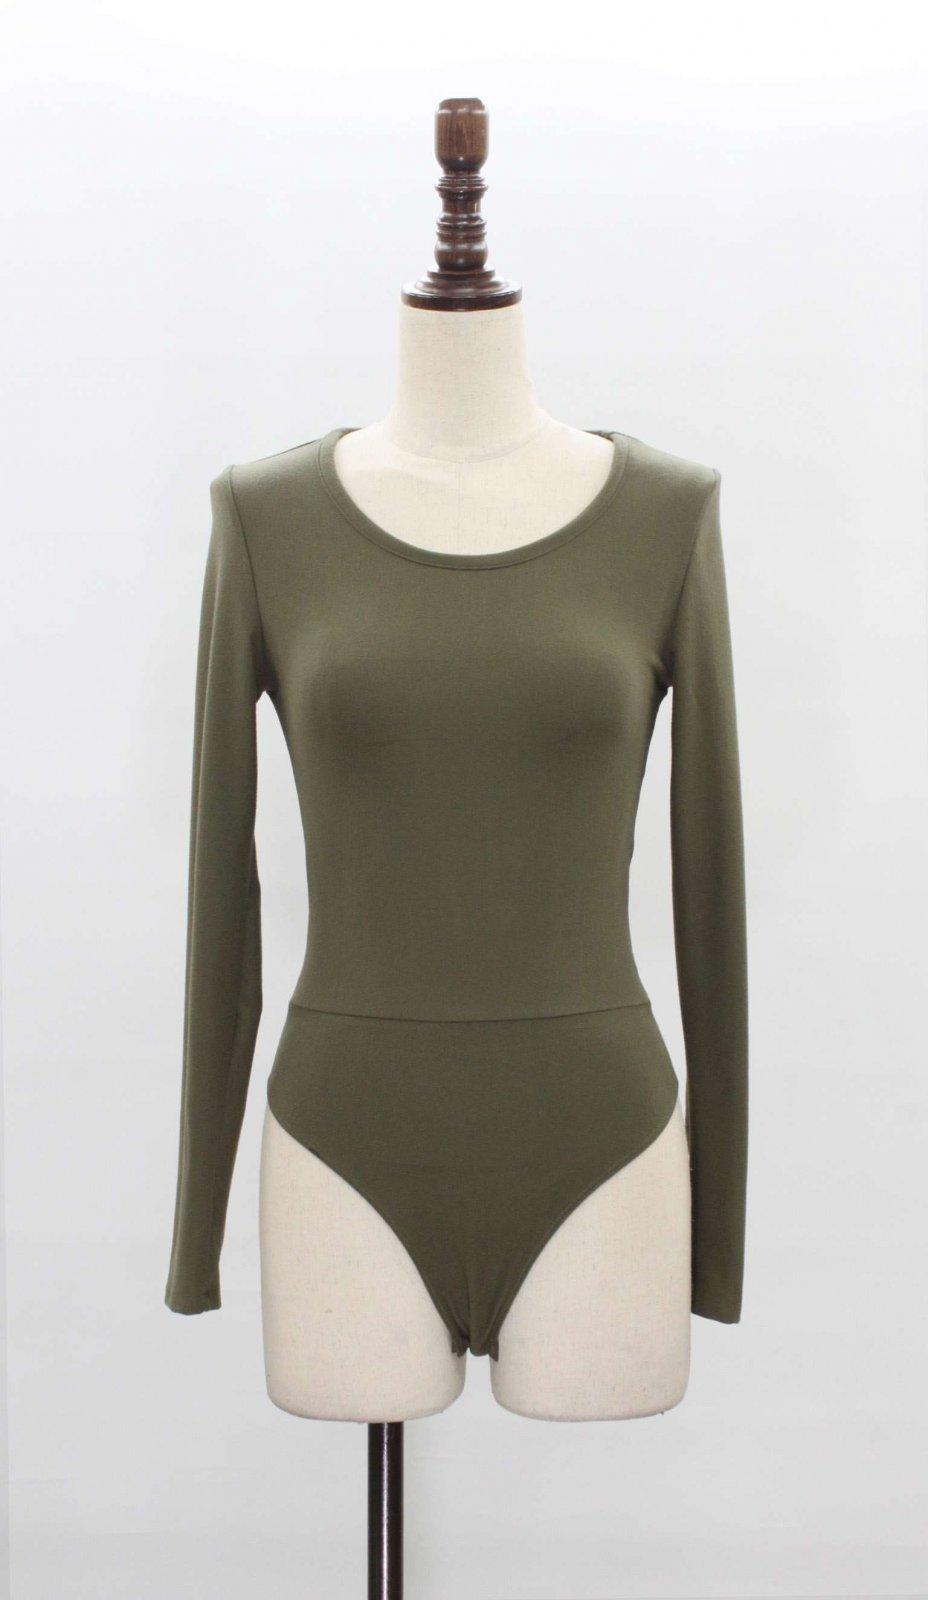 Ripped Back Bodysuit * JR / Miss / Petite OLIVE